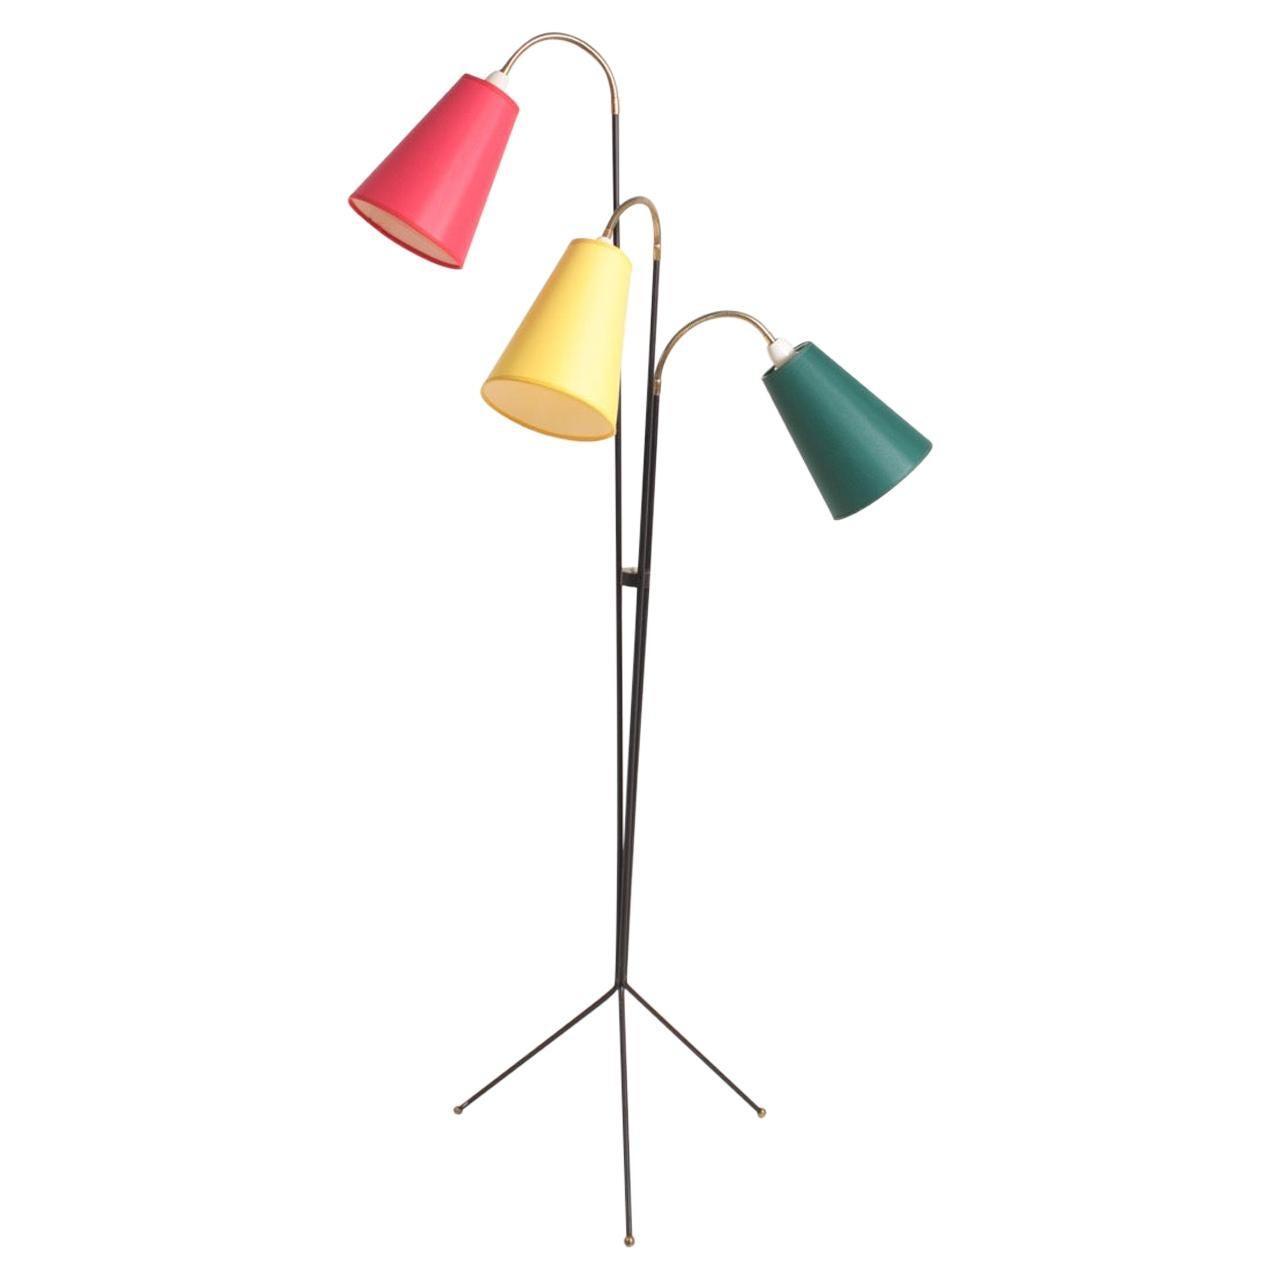 Elegant Danish Midcentury Floor Lamp by Holm Sorensen, Danish Design, 1950s